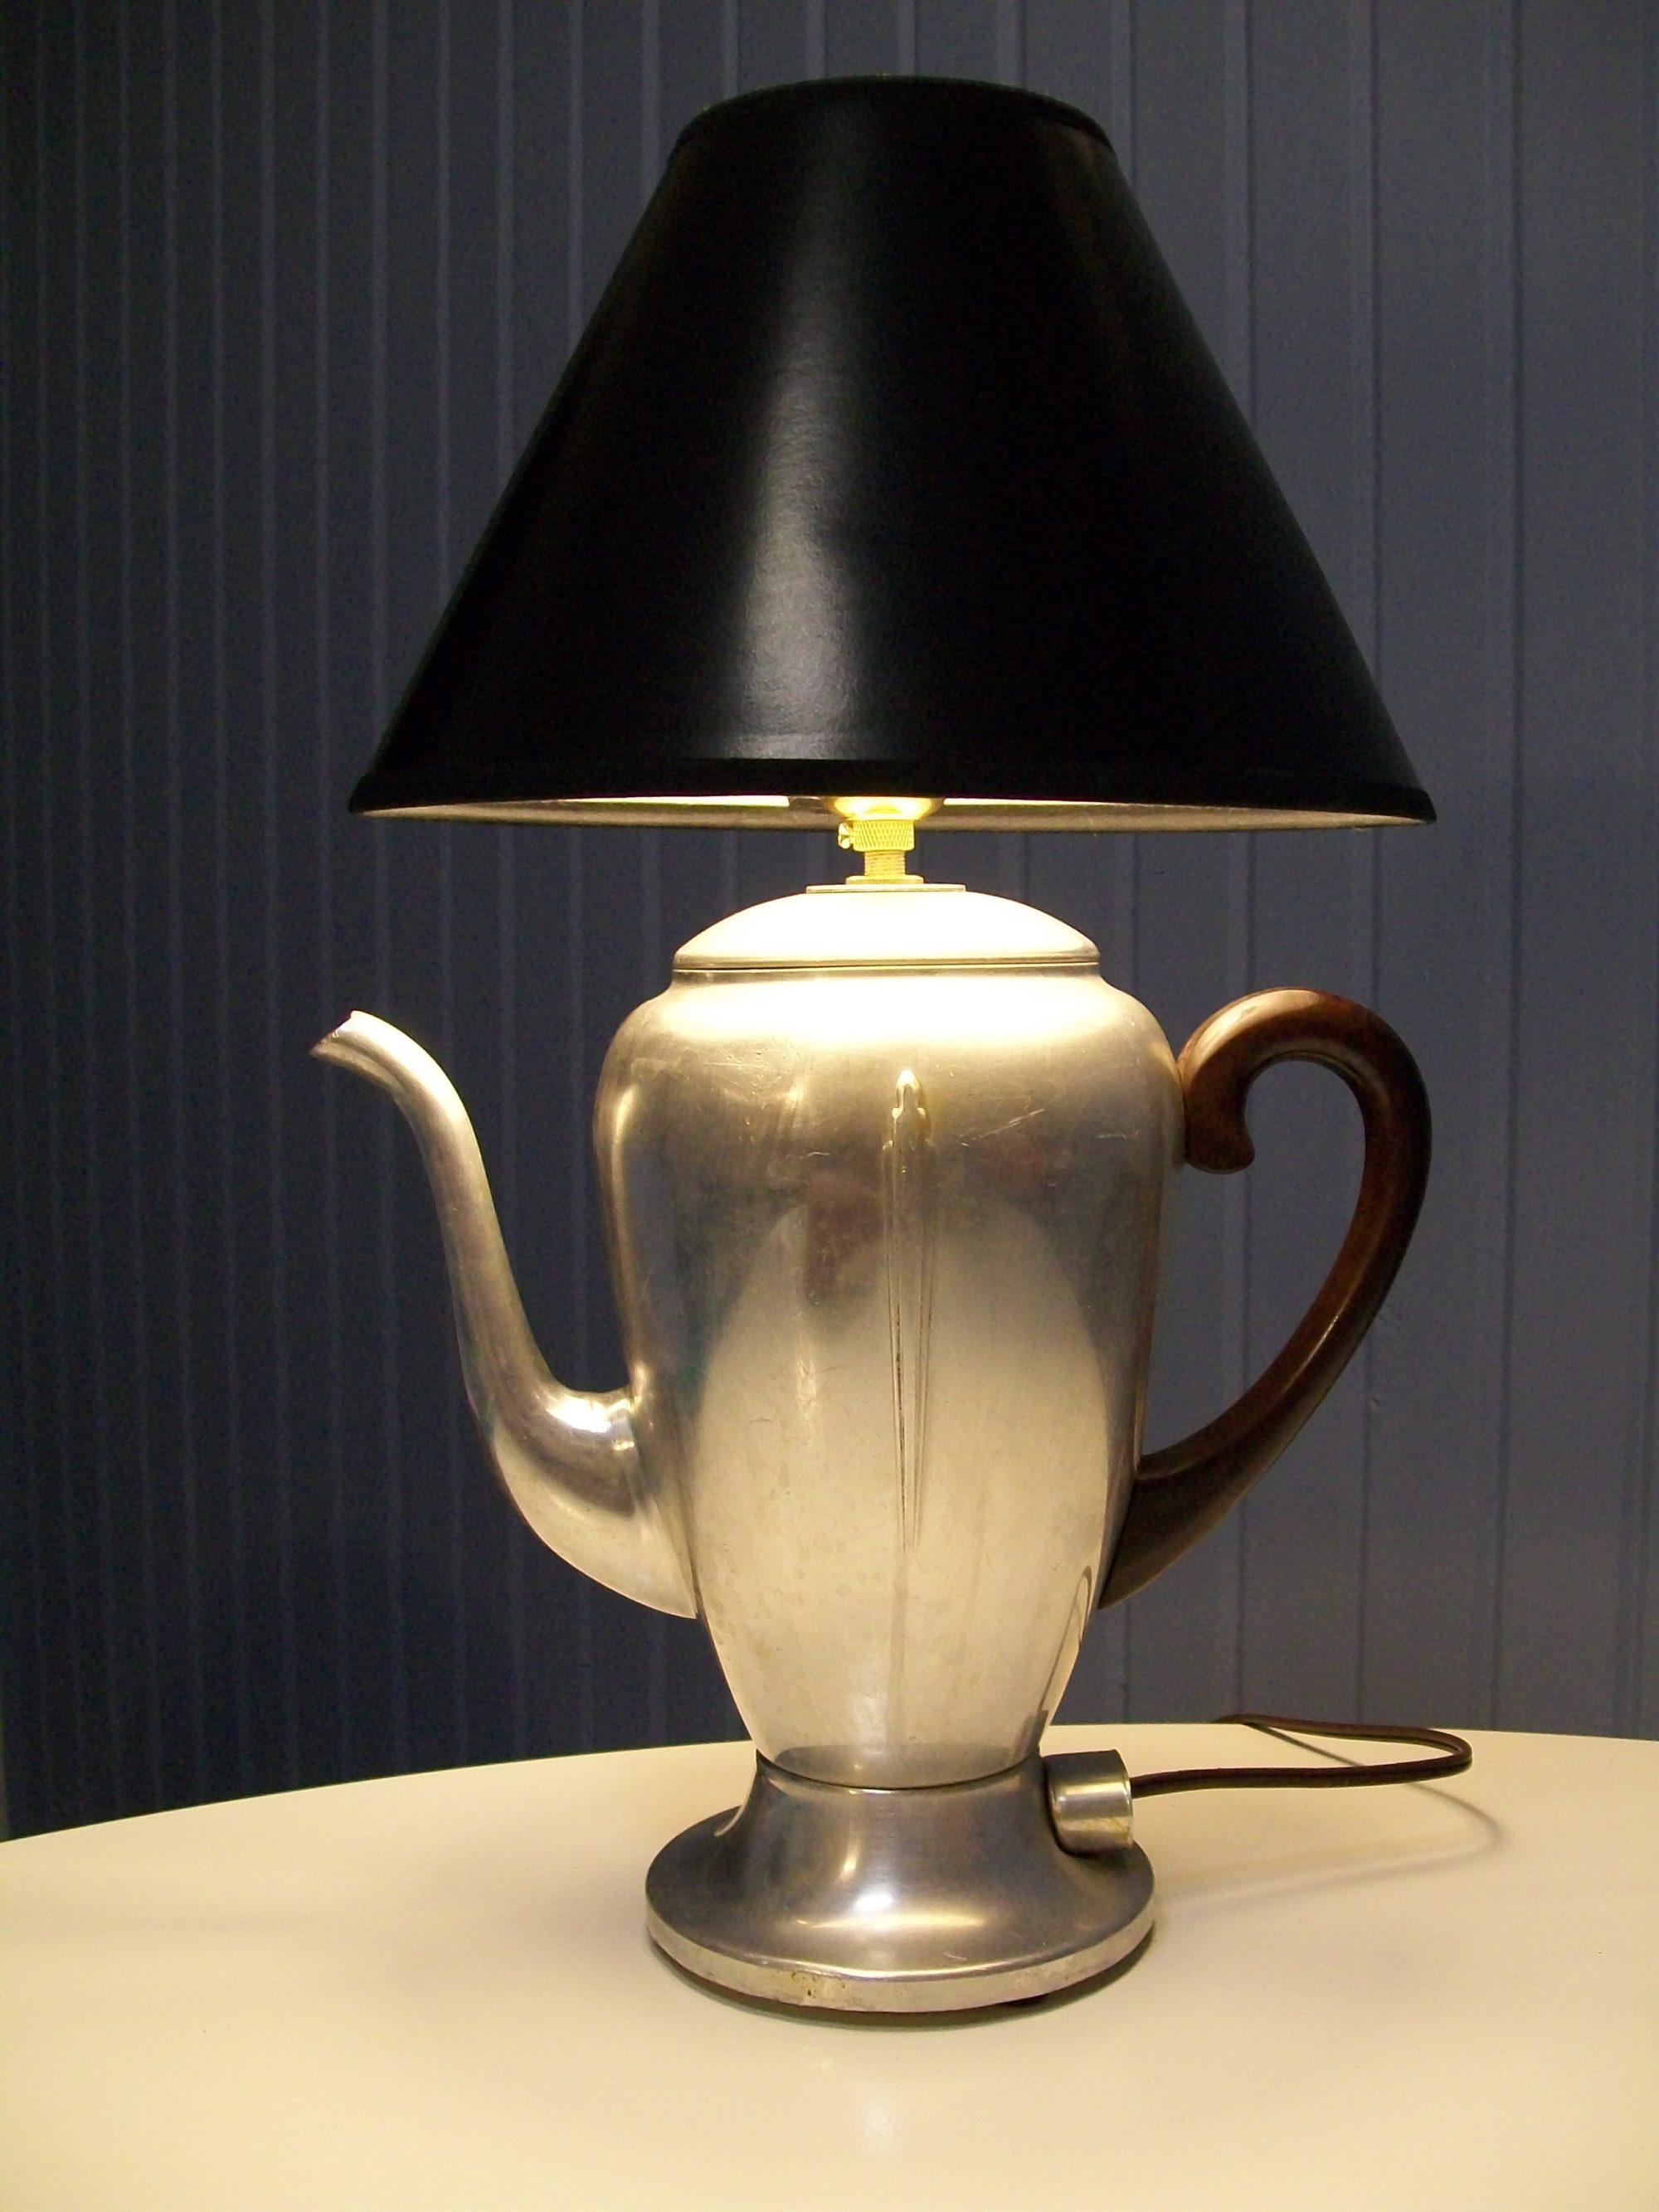 Repurposed Vintage Coffee Pot Lamp My Repurposed Life